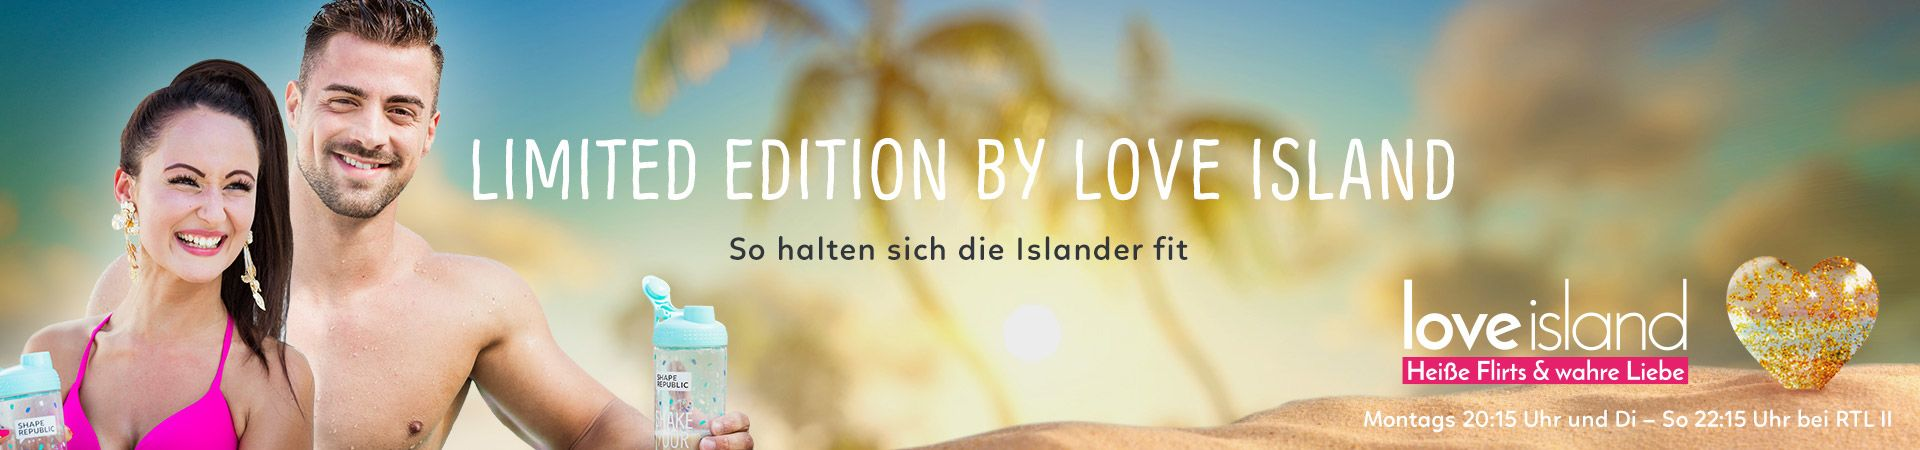 Love Island Limited Edition